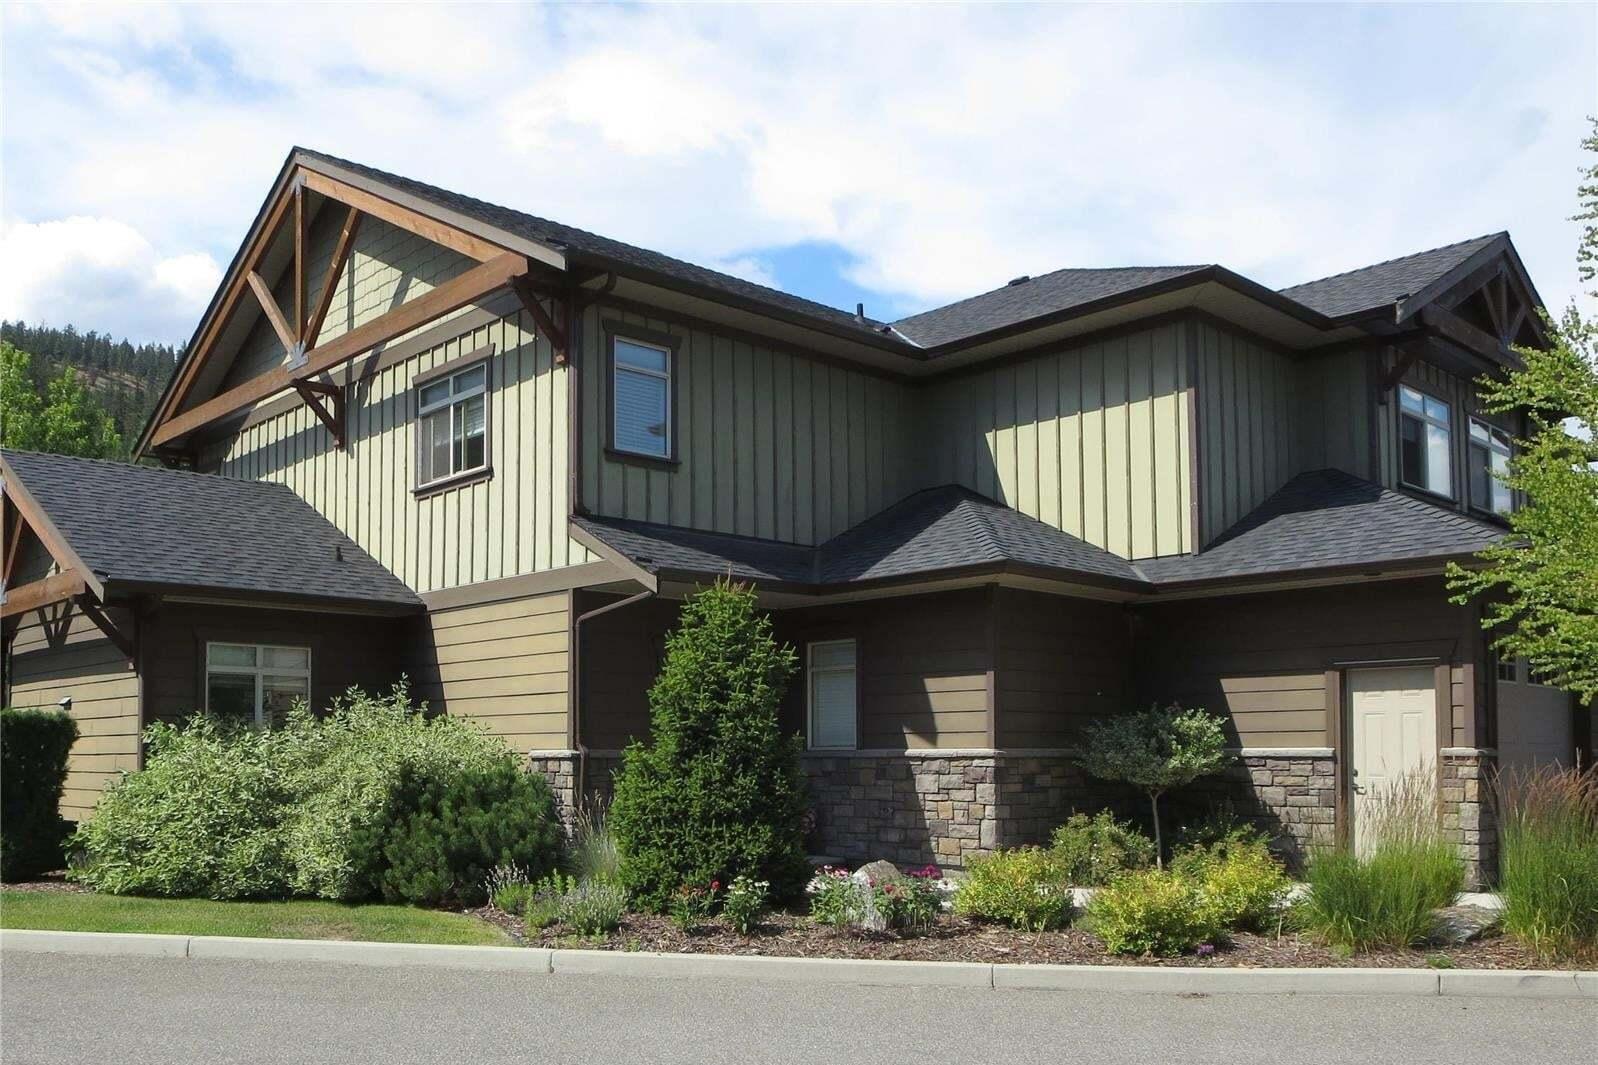 Townhouse for sale at 511 Yates Rd Kelowna British Columbia - MLS: 10209827